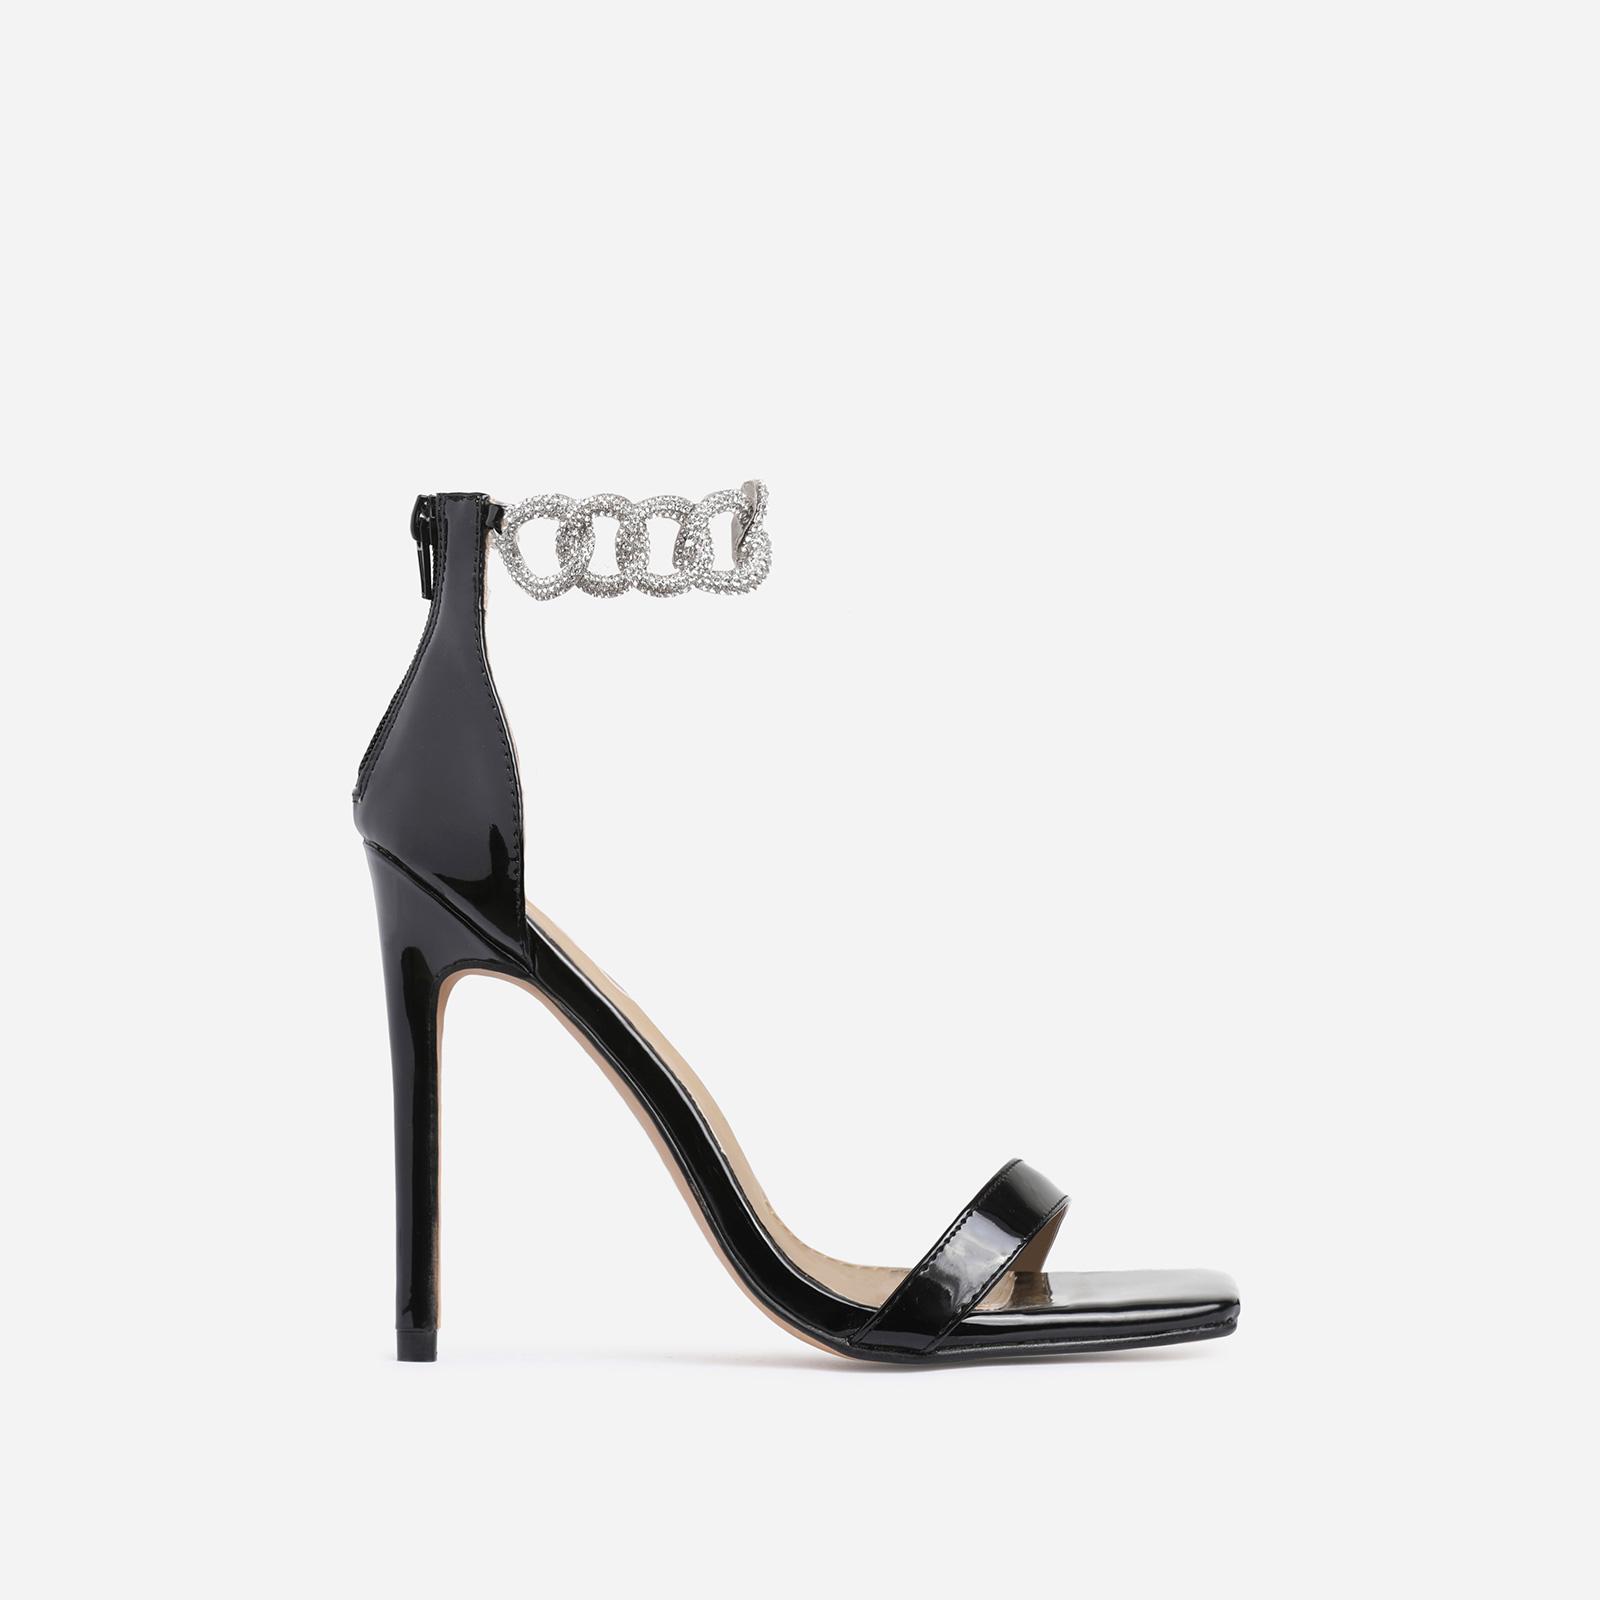 Barbie Diamante Chain Detail Square Toe Heel In Black Patent